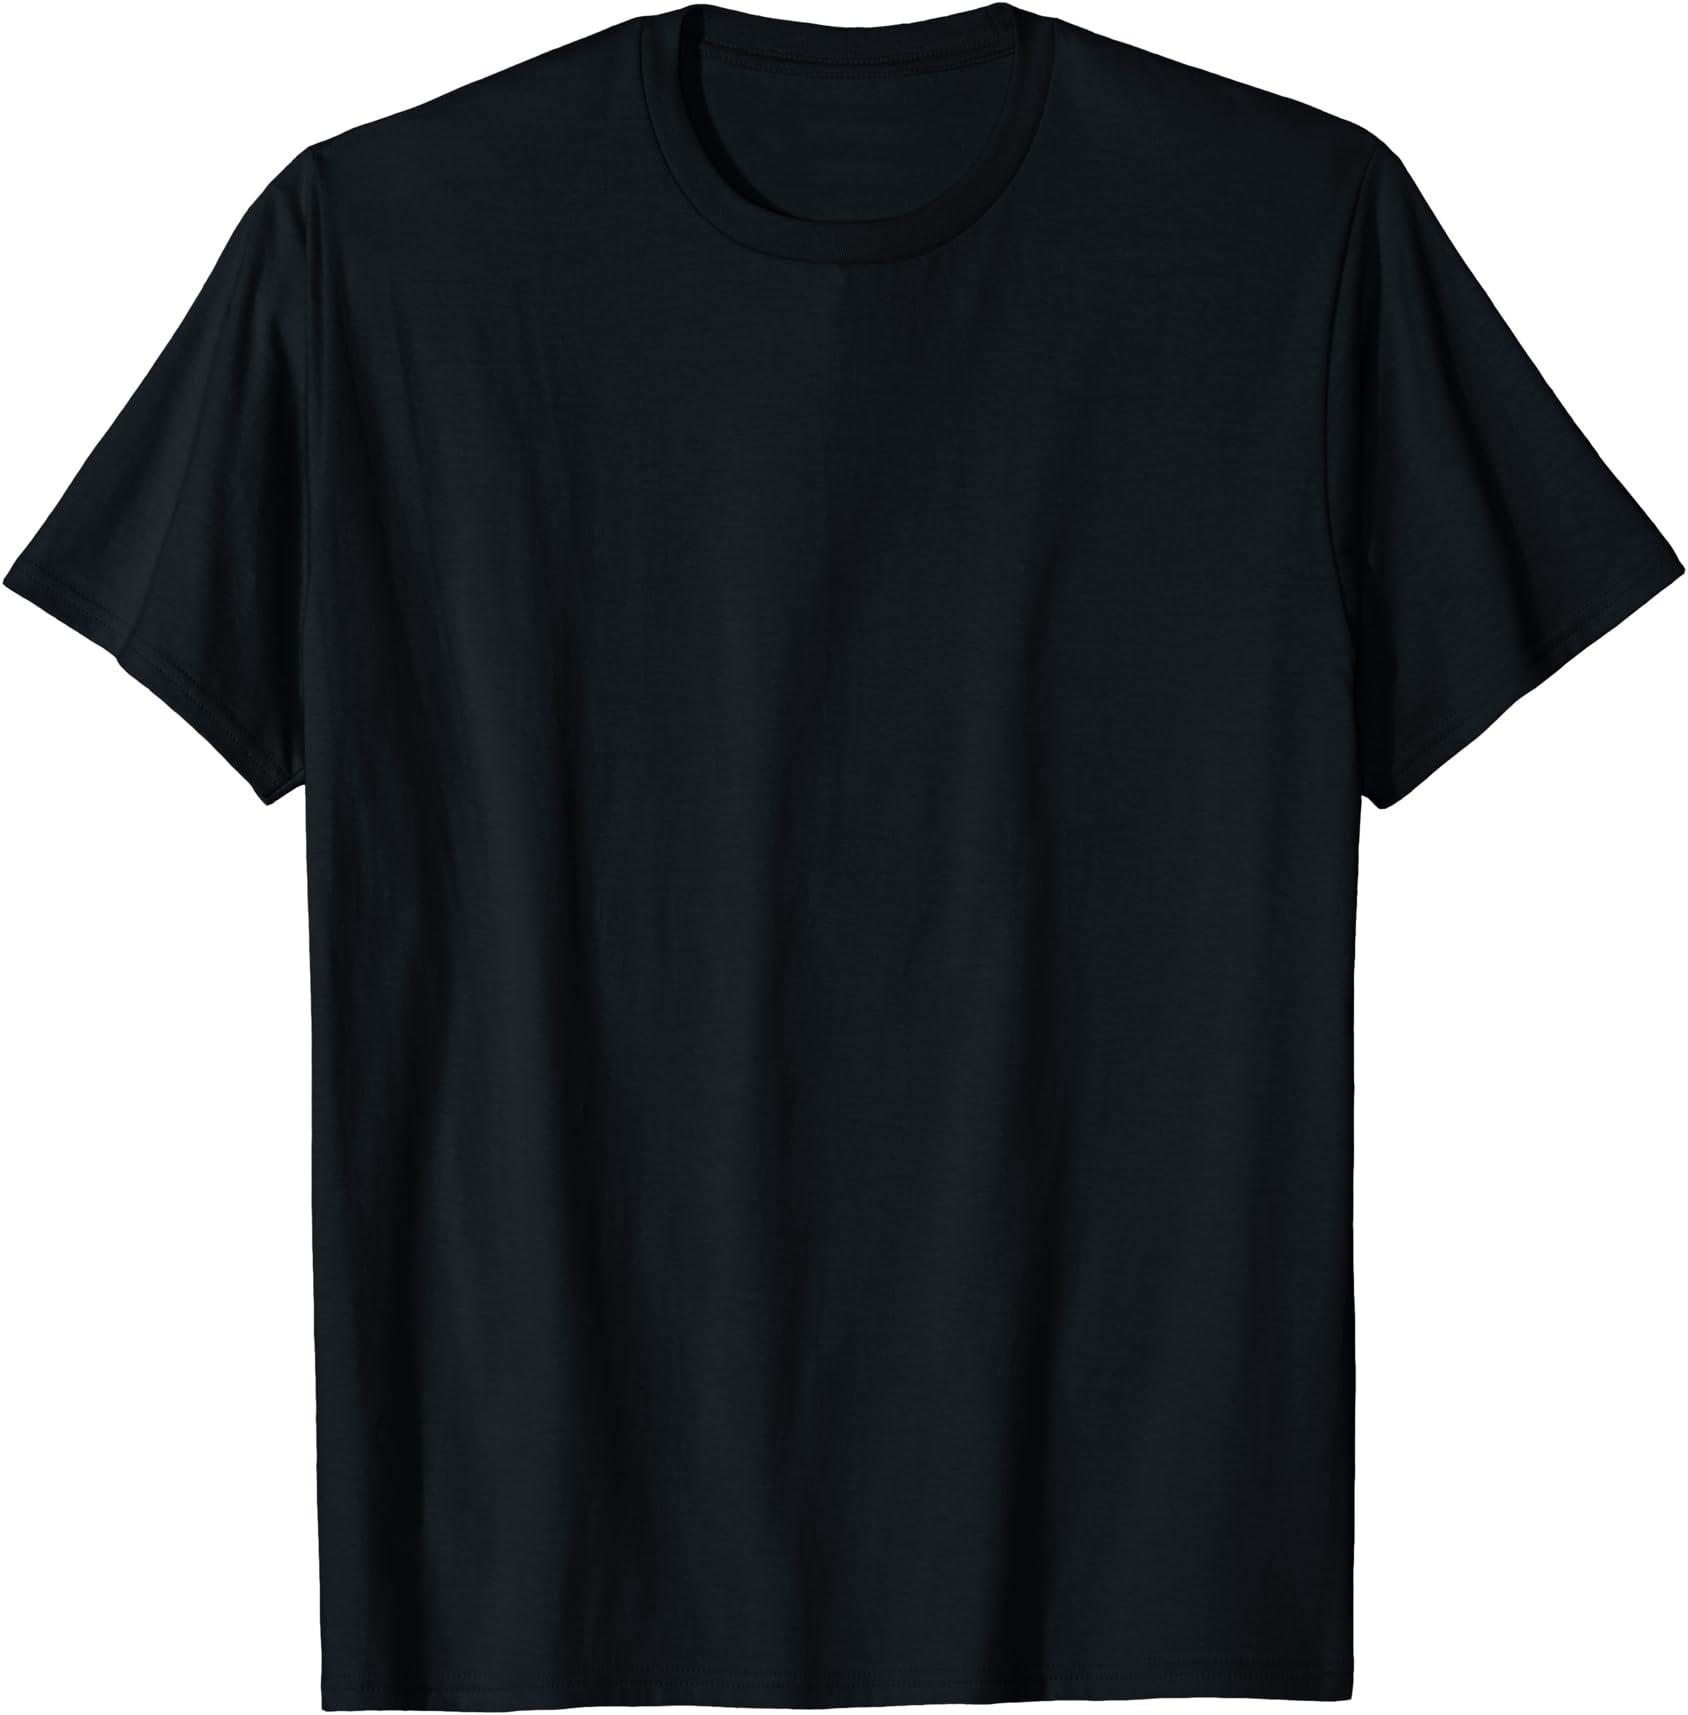 MINISTRY Liberty T-Shirt